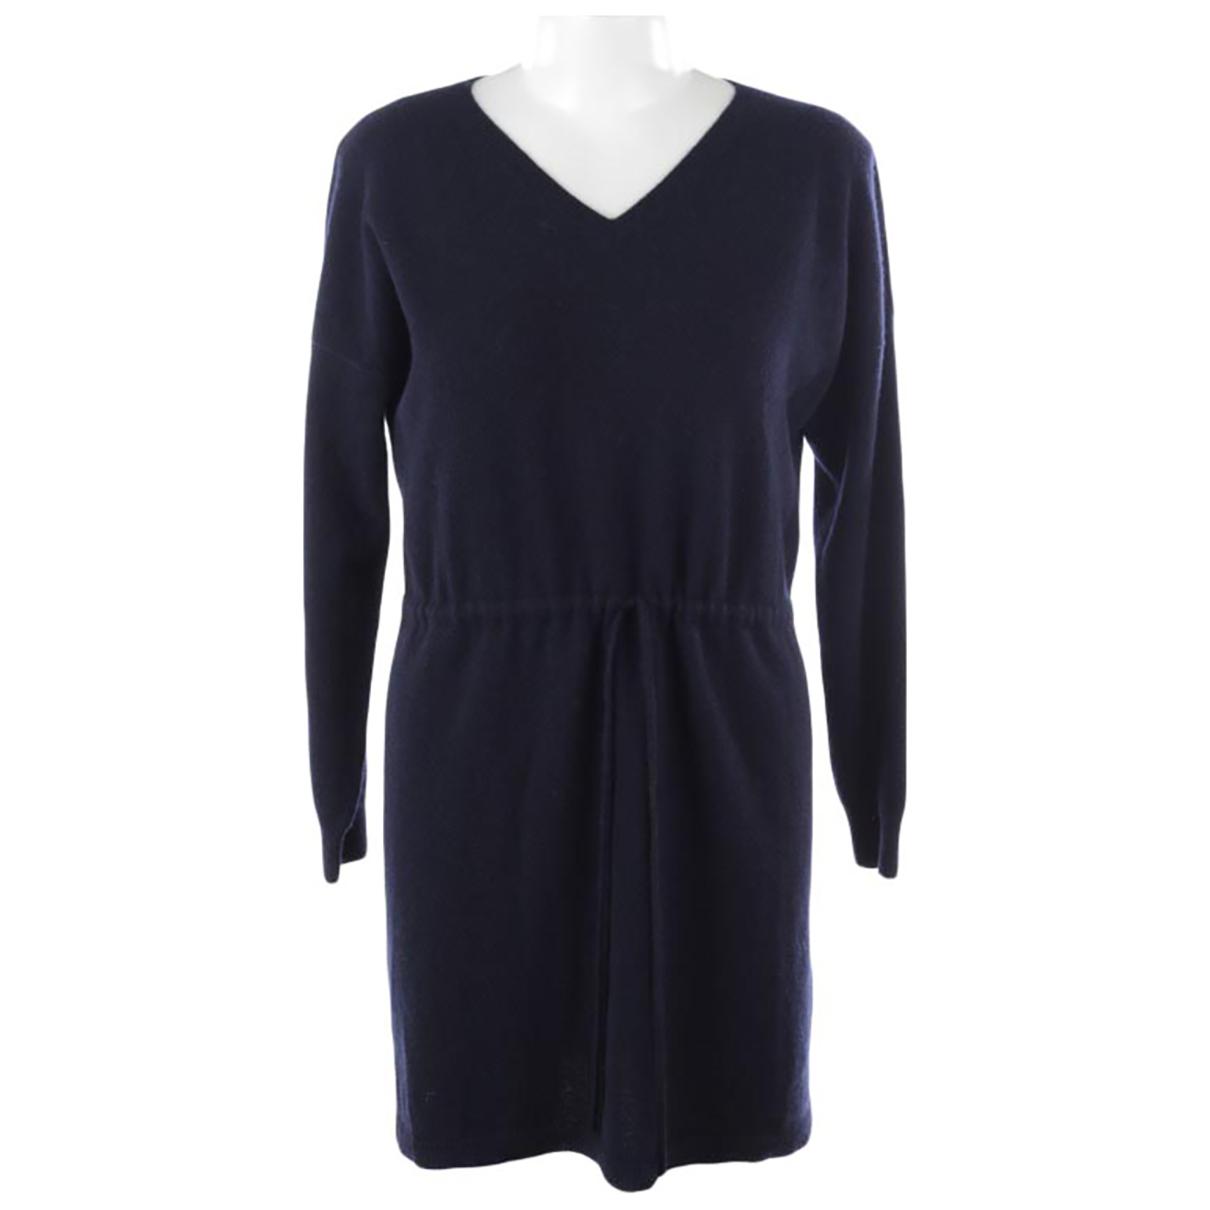 Autre Marque \N Kleid in  Blau Kaschmir